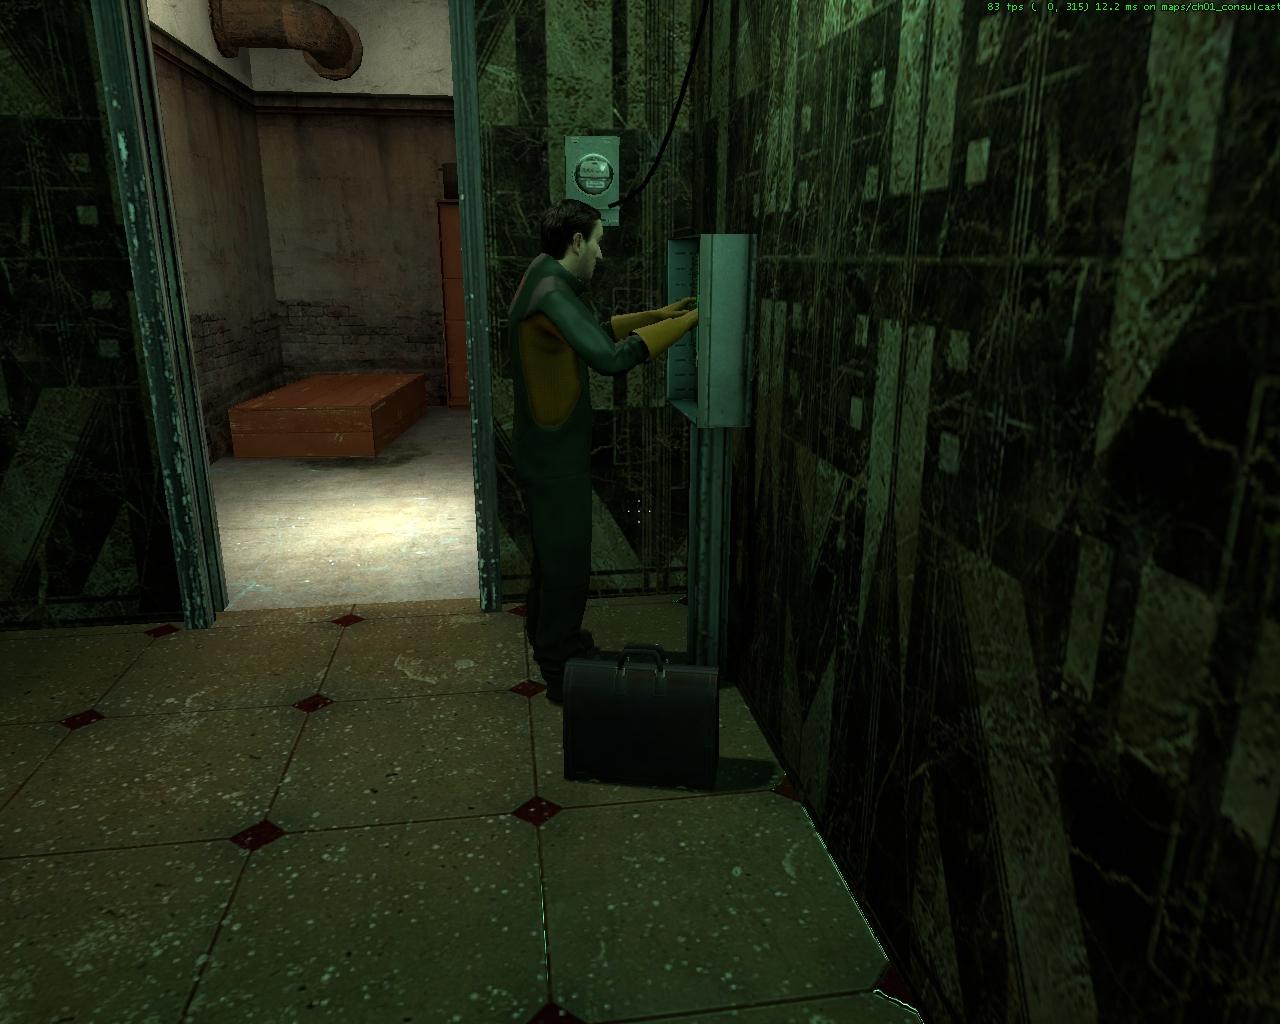 ch01_consulcast0110.jpg - Half-Life 2 ch01_consulcast, Dark Interval, Dark Interval: Part 1